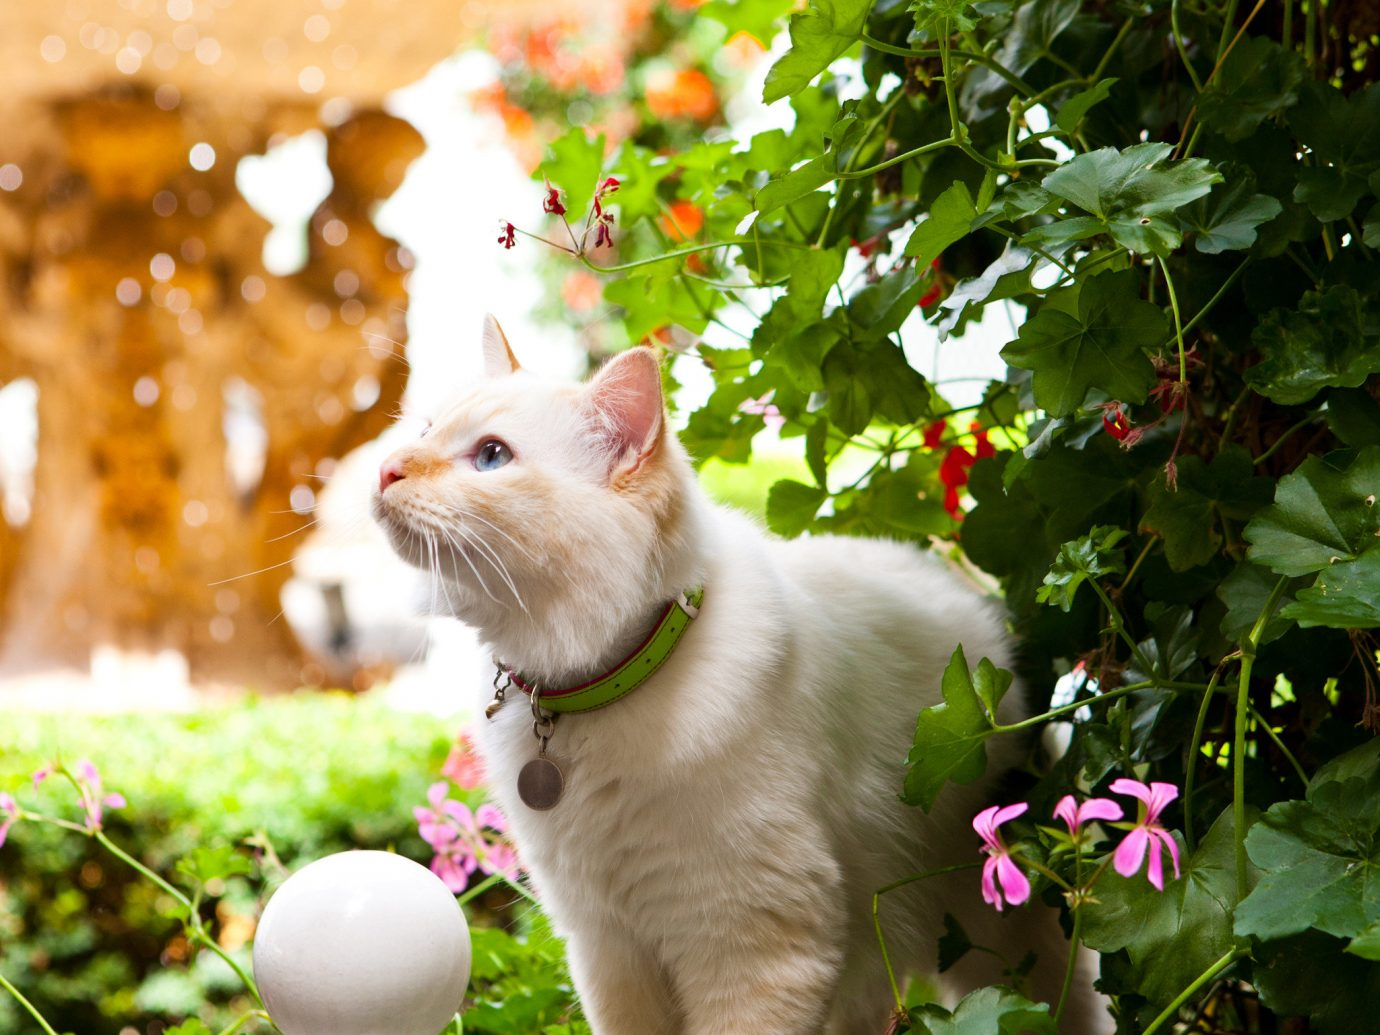 Offbeat tree flower cat mammal plant outdoor Garden white domestic cat